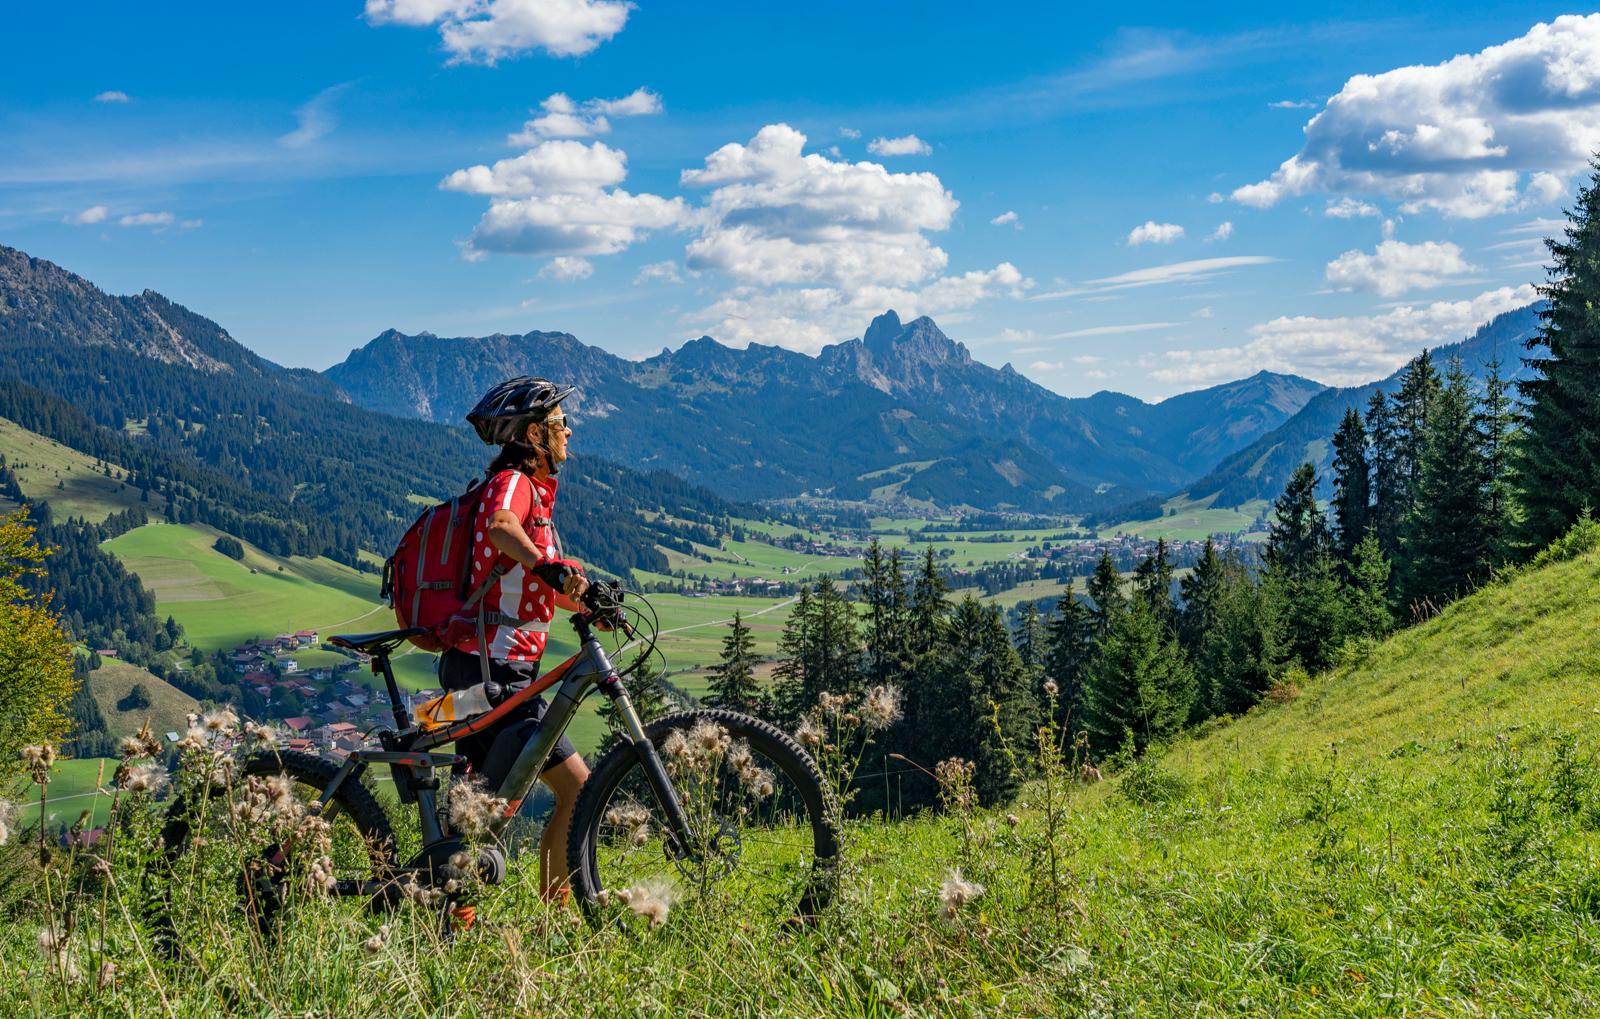 aktivurlaub-inkl-e-bike-und-rafting-2-uen-2-personen-bg1